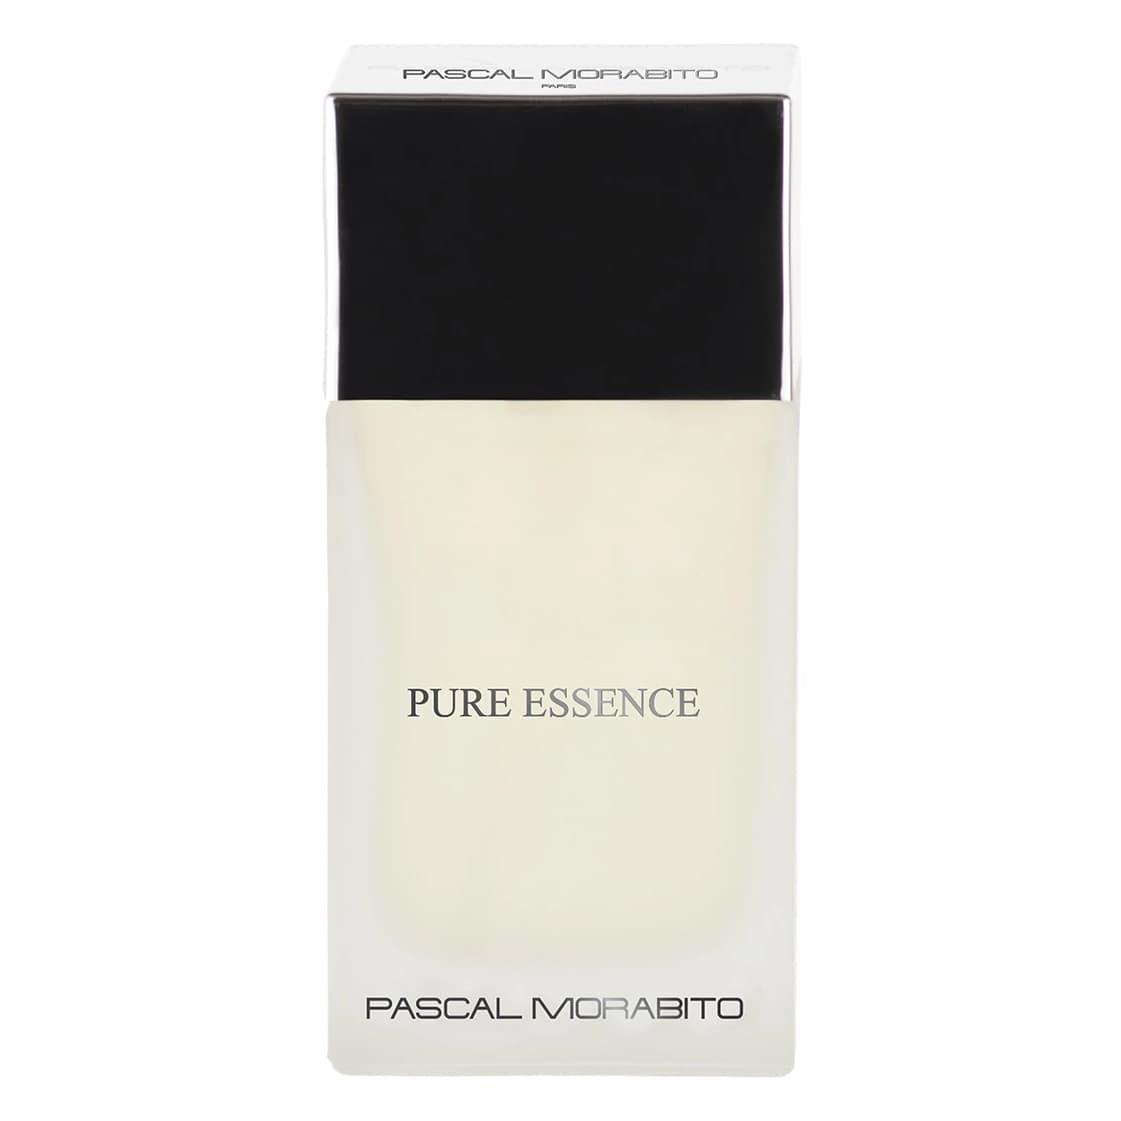 Pascal Morabito - Pure Essence Eau de Toilette